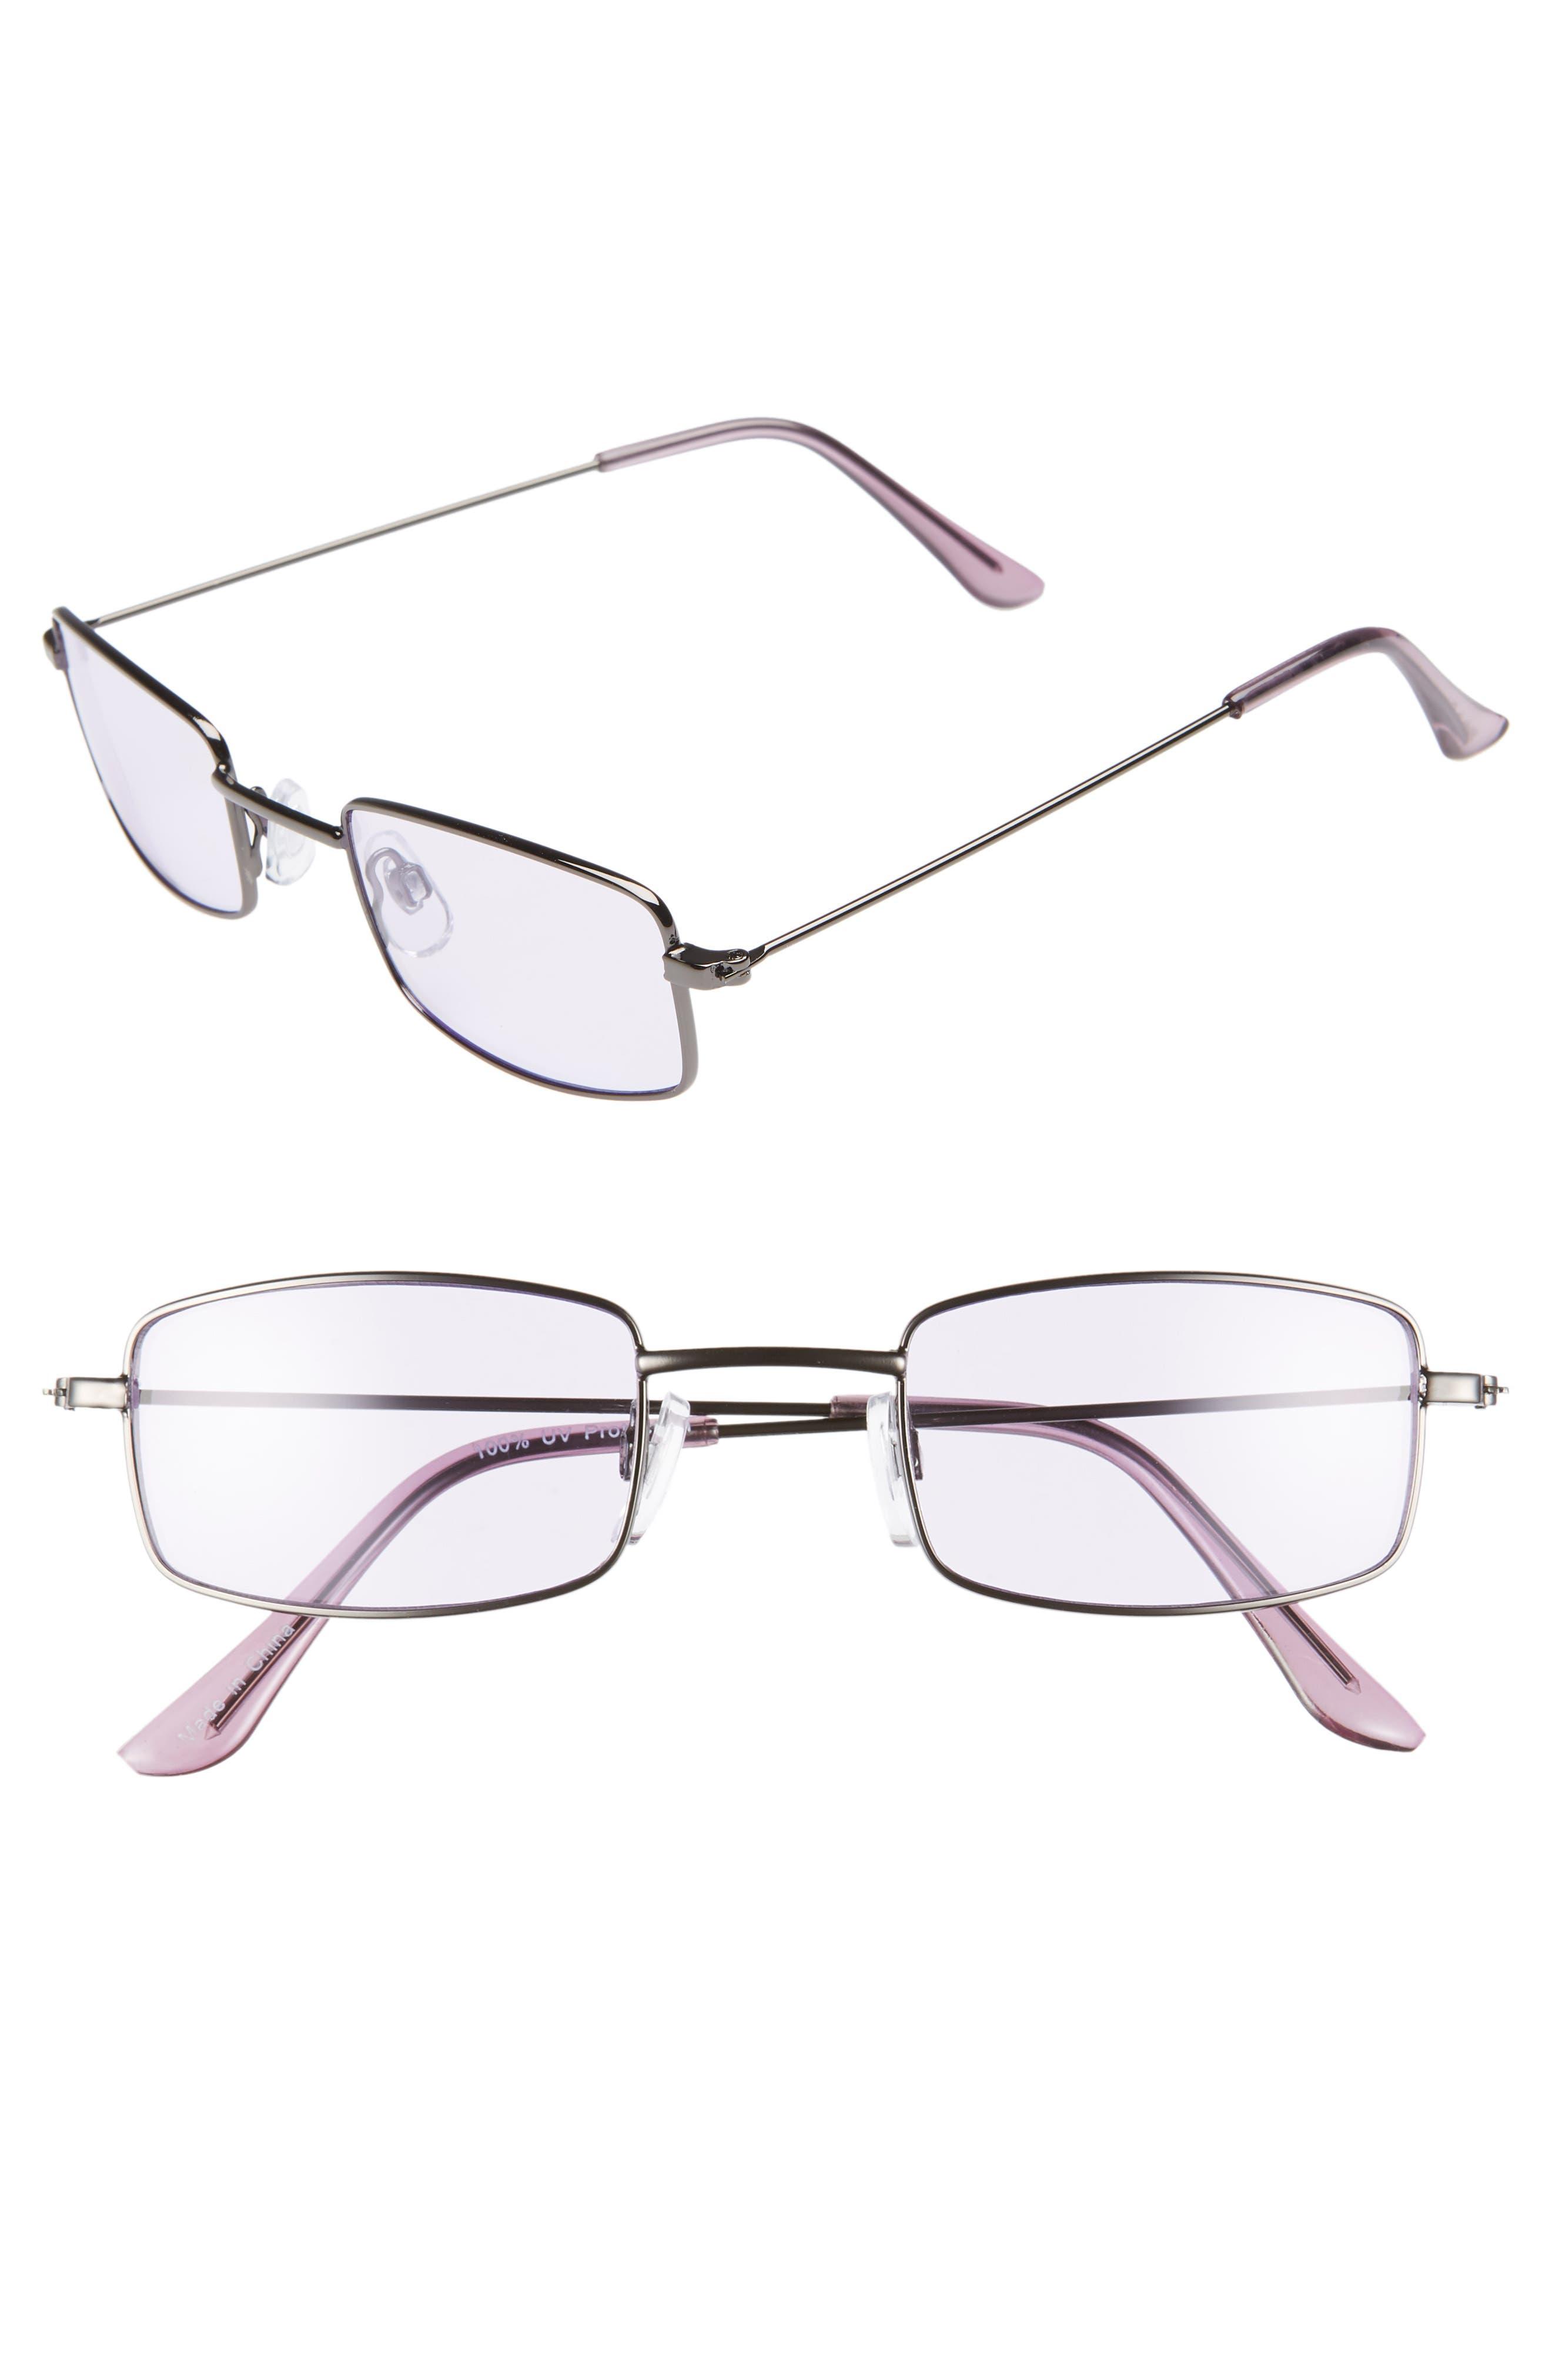 45mm Square Sunglasses,                         Main,                         color, GUNMETAL/ PURPLE